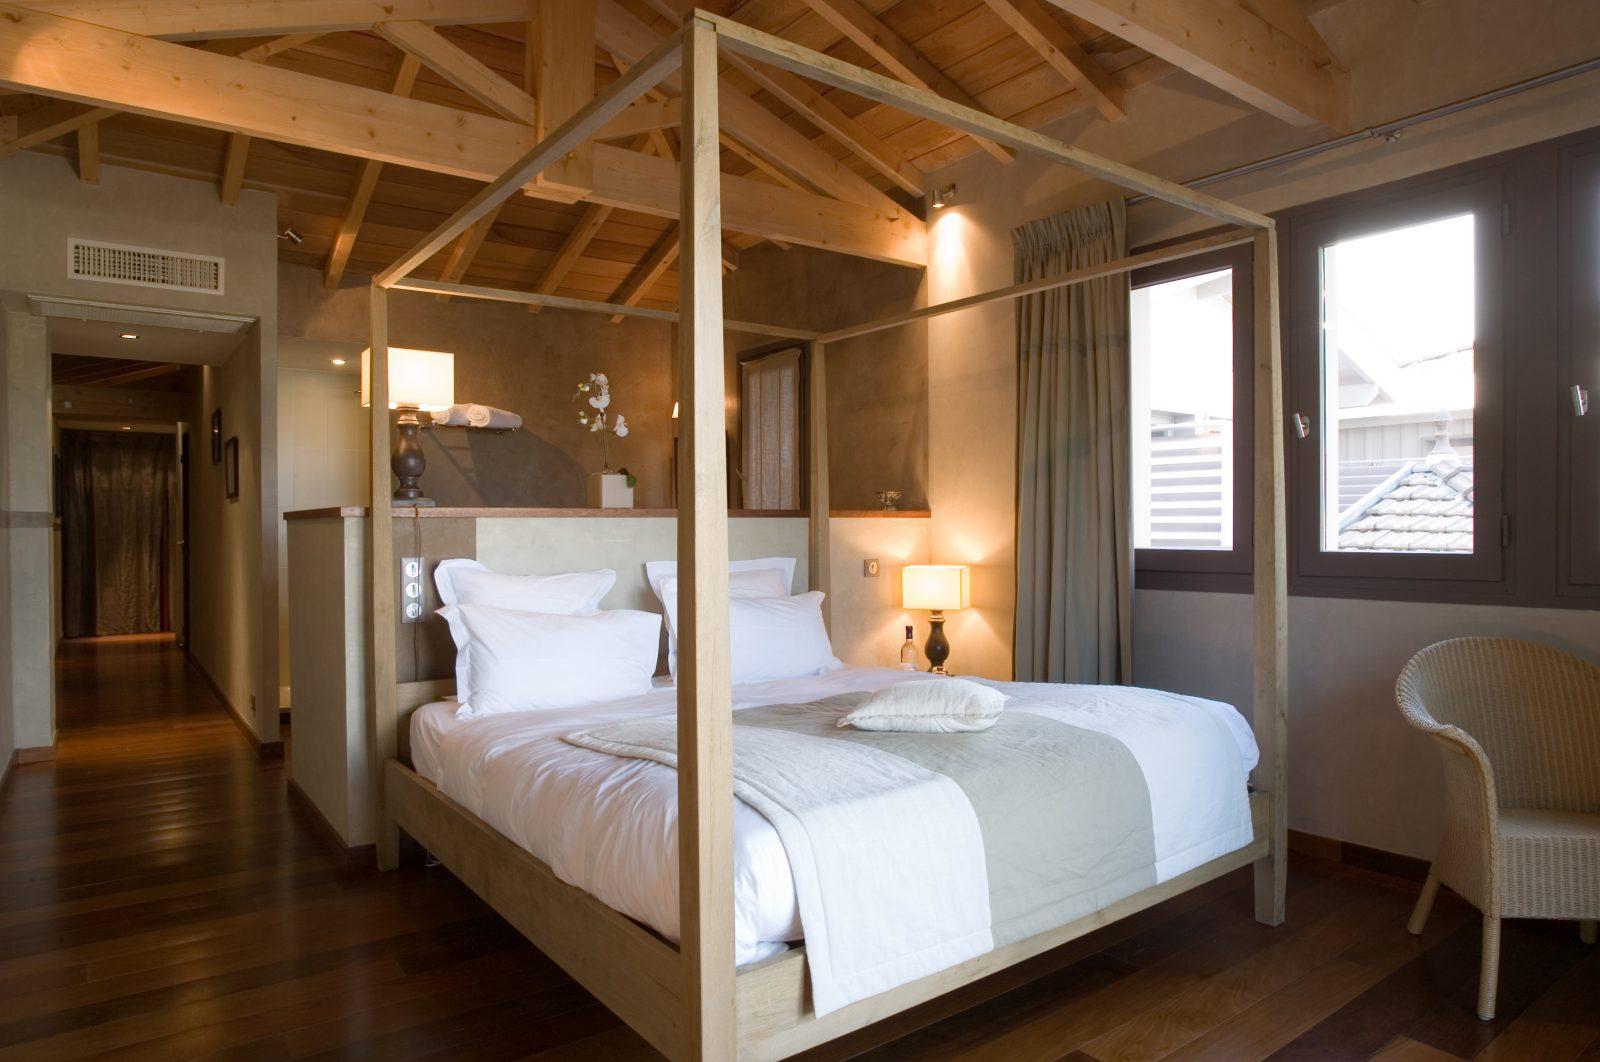 Hotel_Cote_Sable (2)